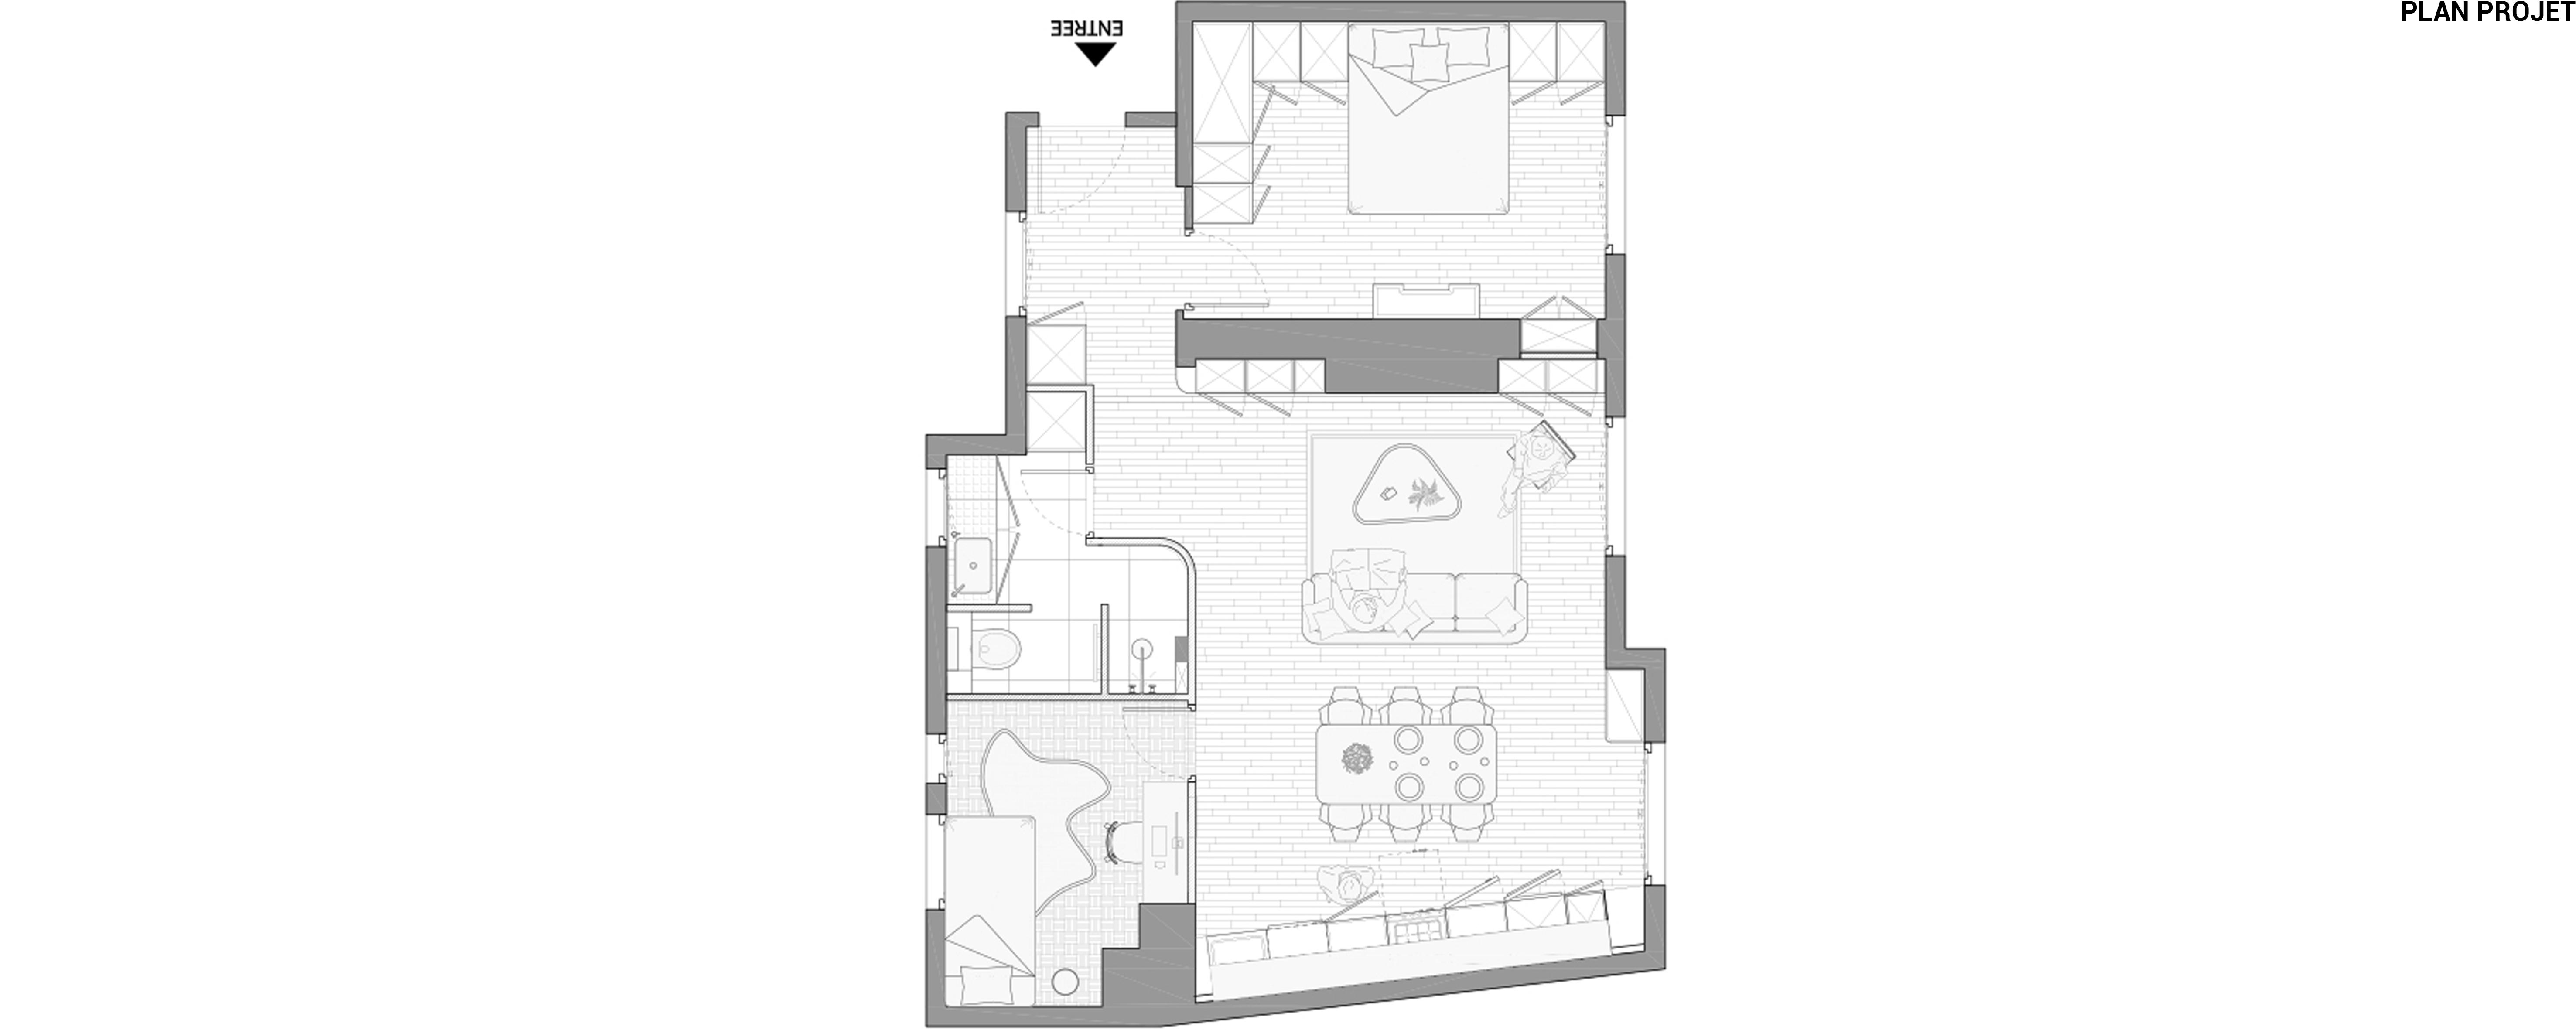 BATIGNOLLE – Plan projet bis